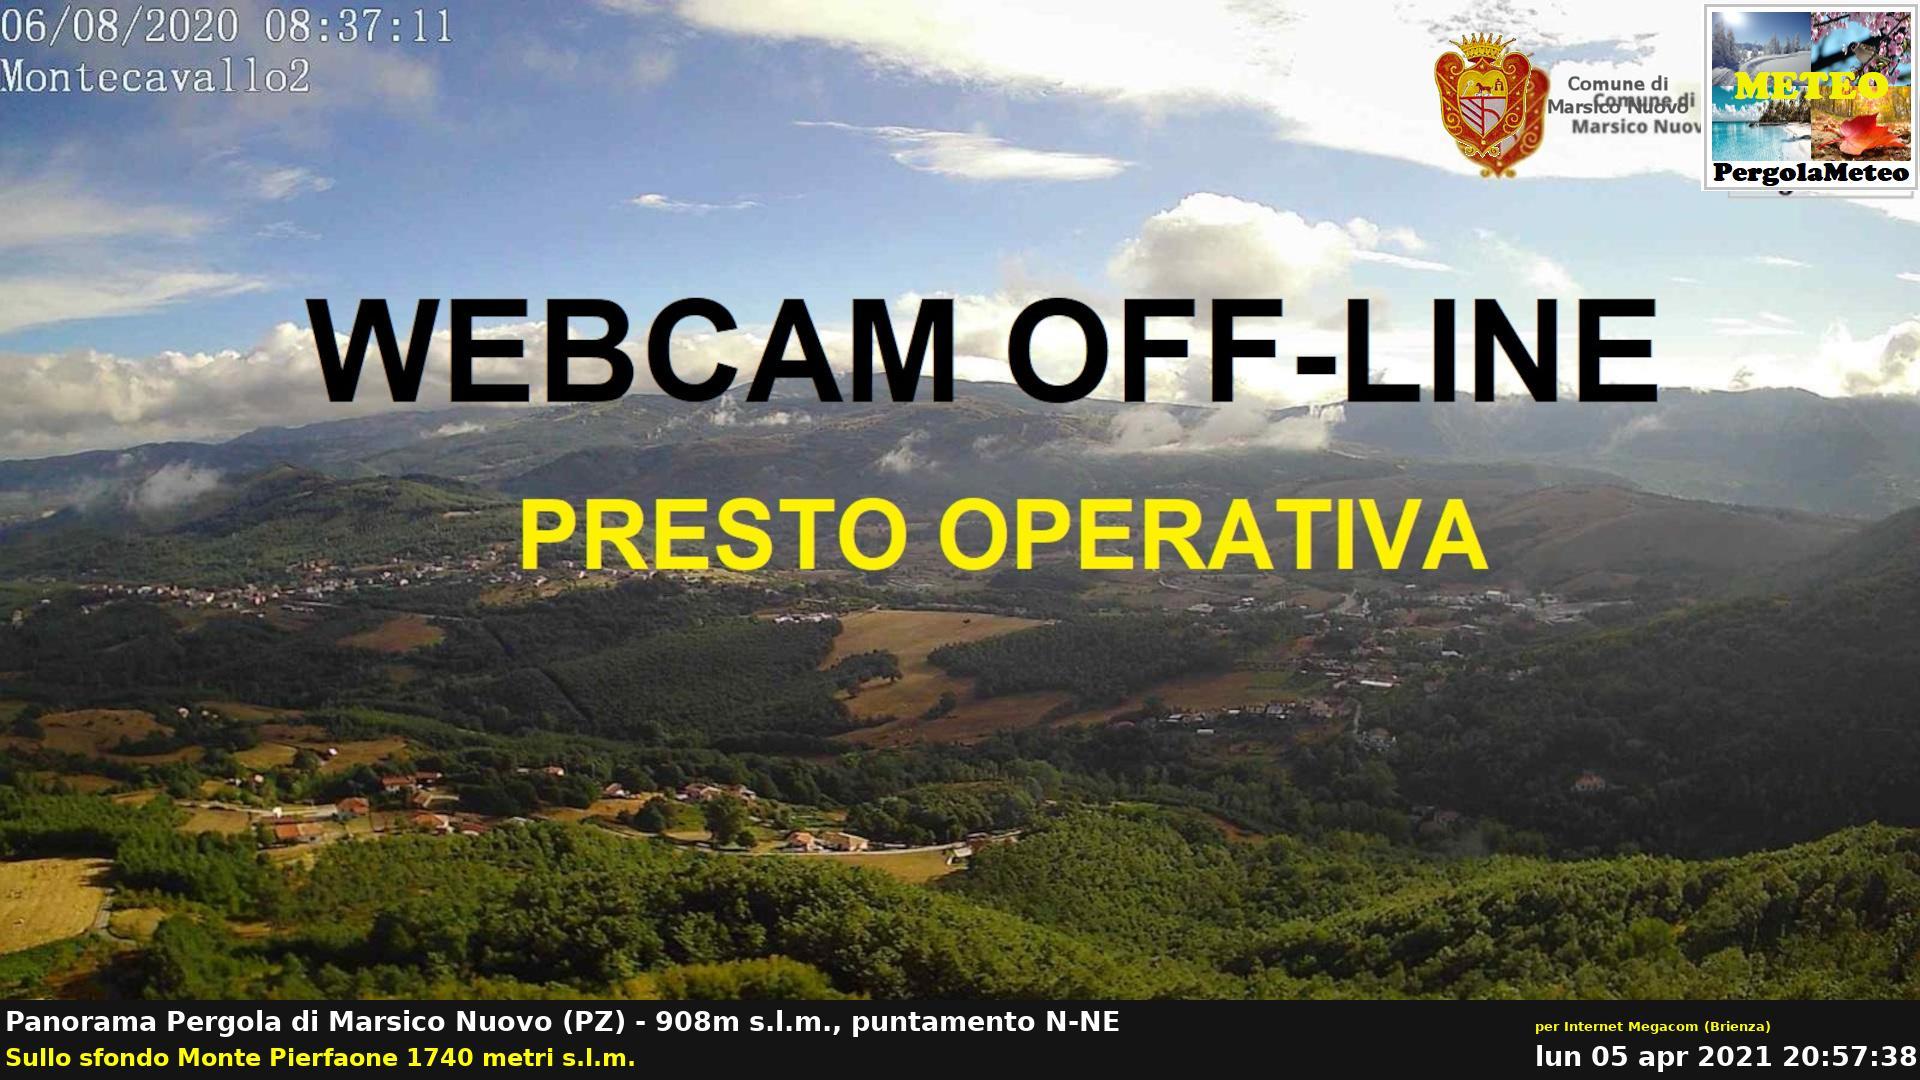 http://www.pergolameteo.it/joomla/montecavallo2/FoscamCamera_00626EEDF2EA/snap/webcam.php